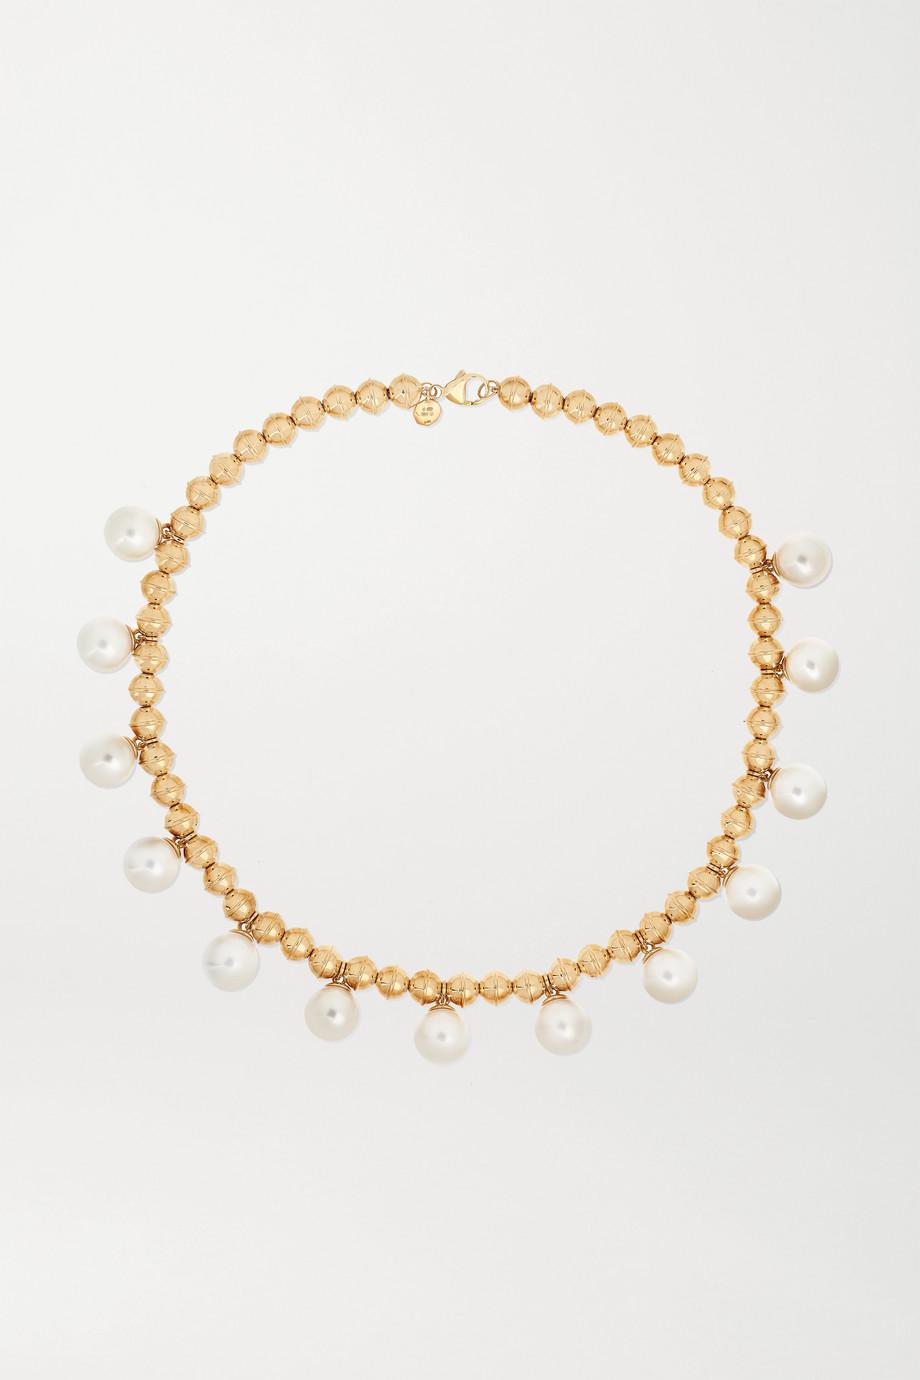 Marlo Laz Collier en or 14 carats et perles